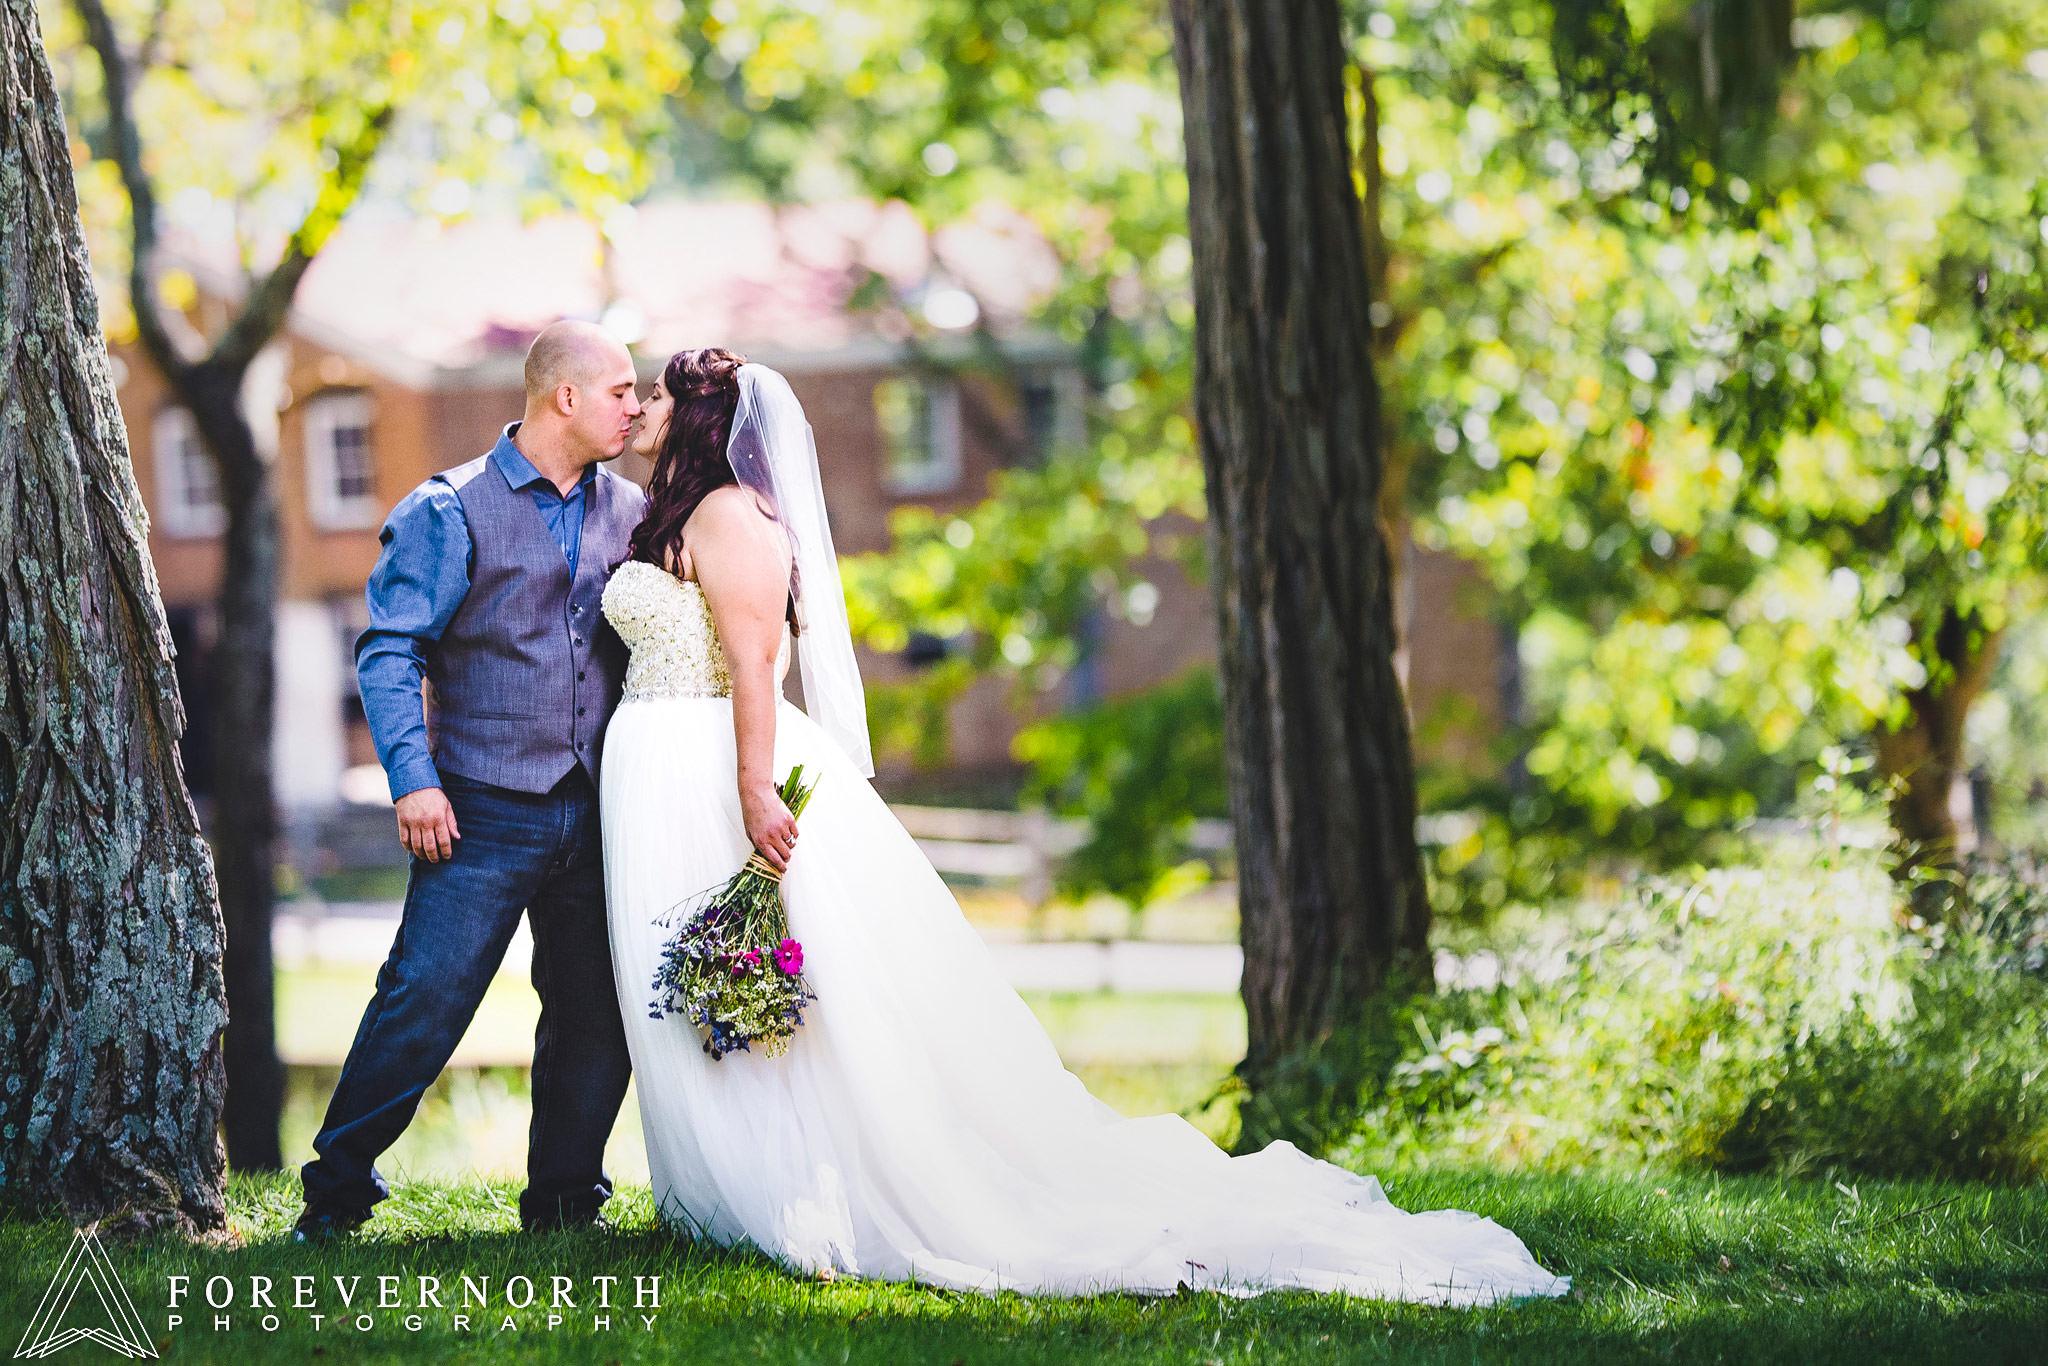 Brown-Allaire-State-Park-Wedding-Photographer-27.JPG